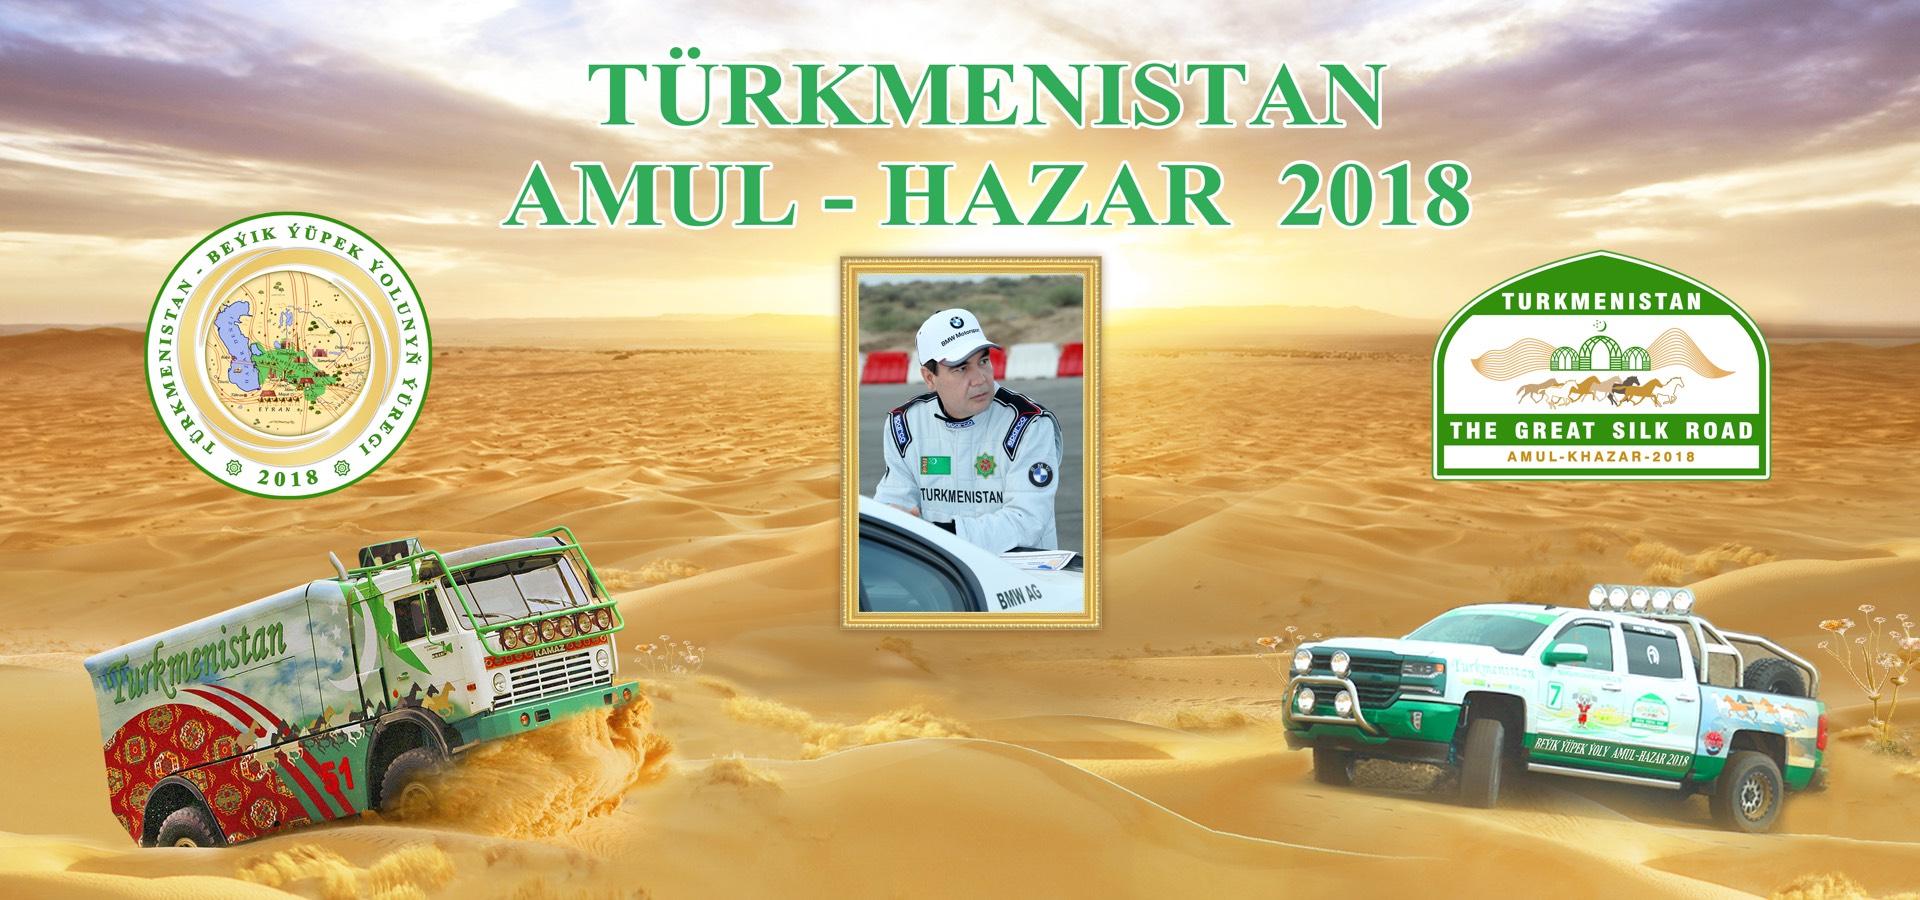 Amul hazar 2018 logo